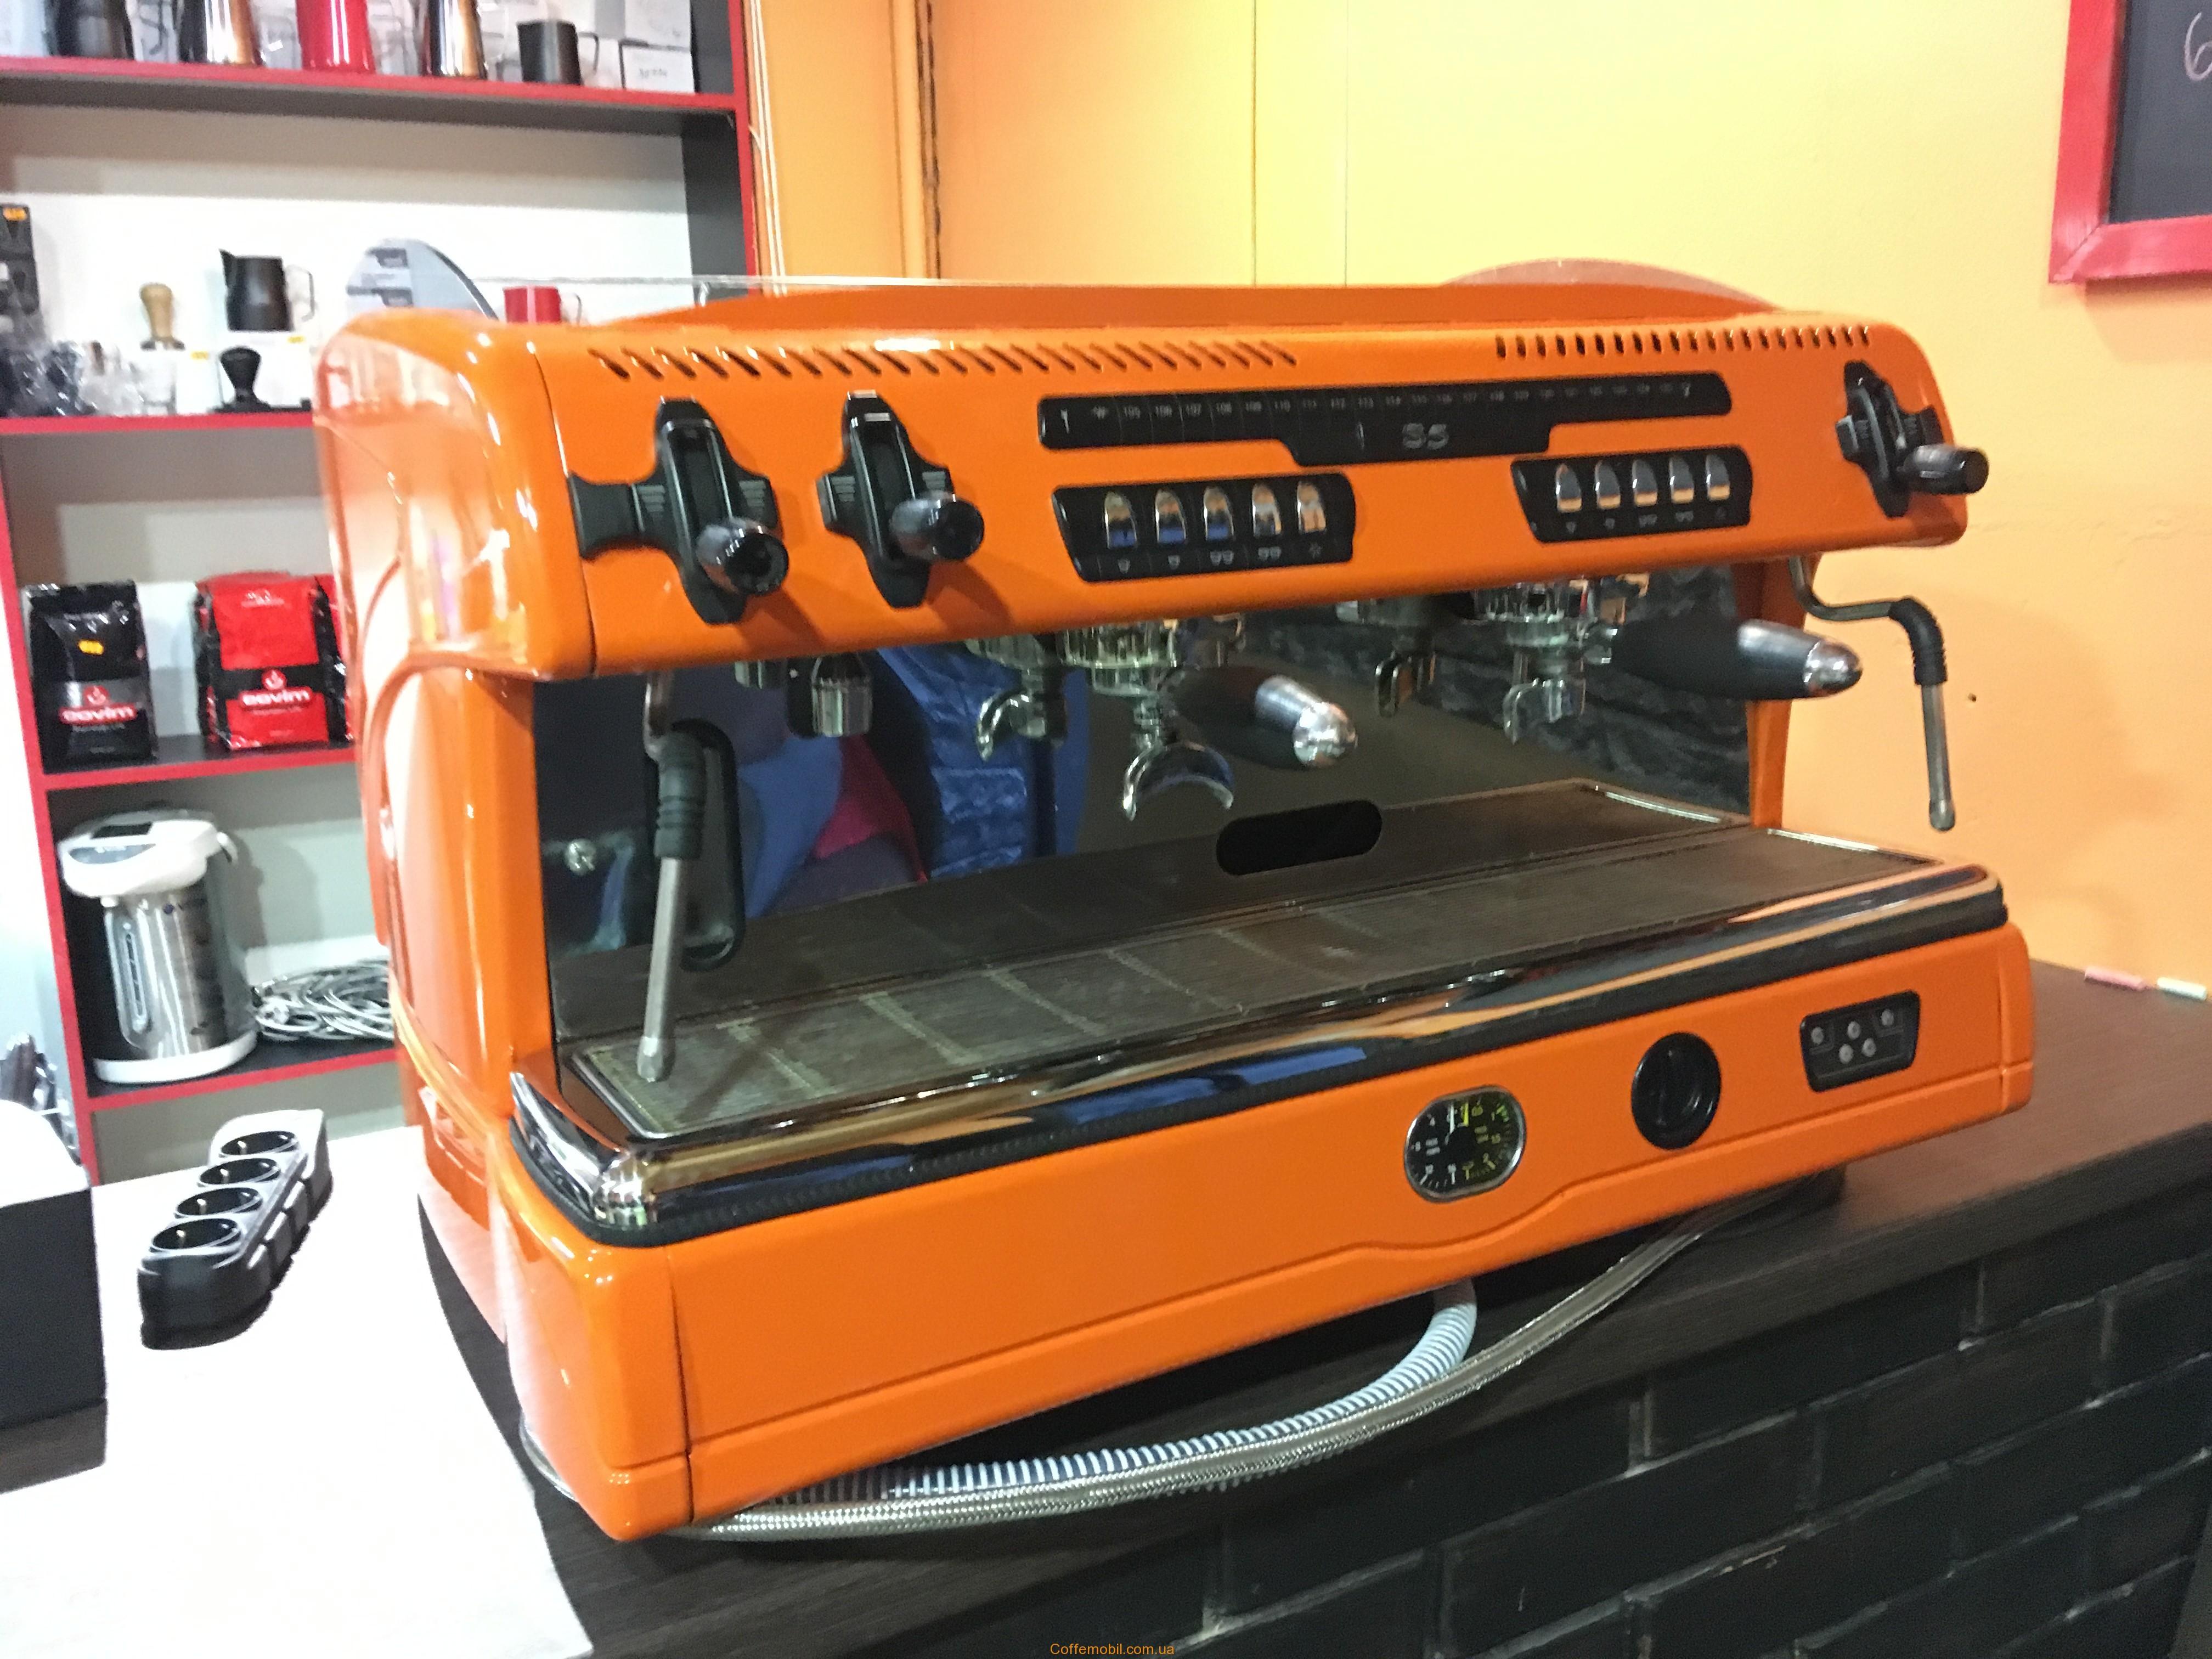 бу профессиональная кофеварка La Spaziale s5 цена